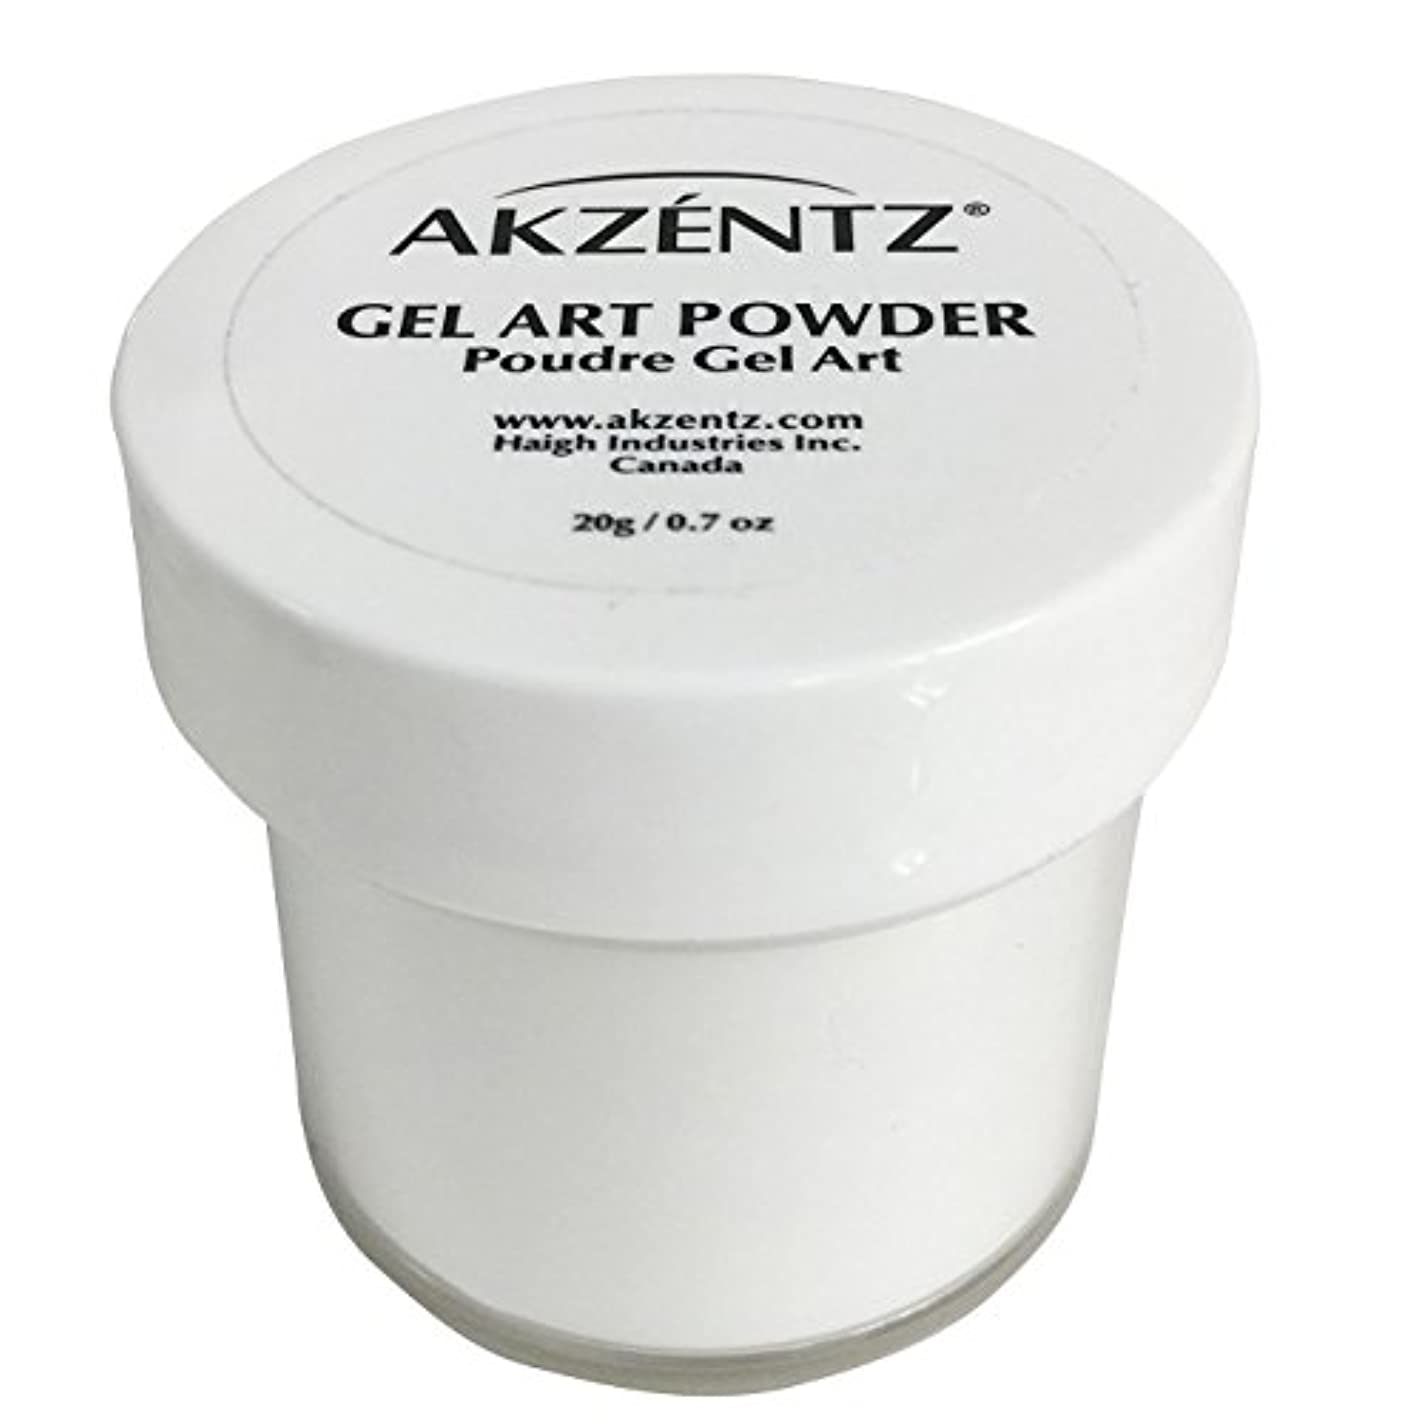 AKZENTZ(アクセンツ) ジェルアートパウダー 20g